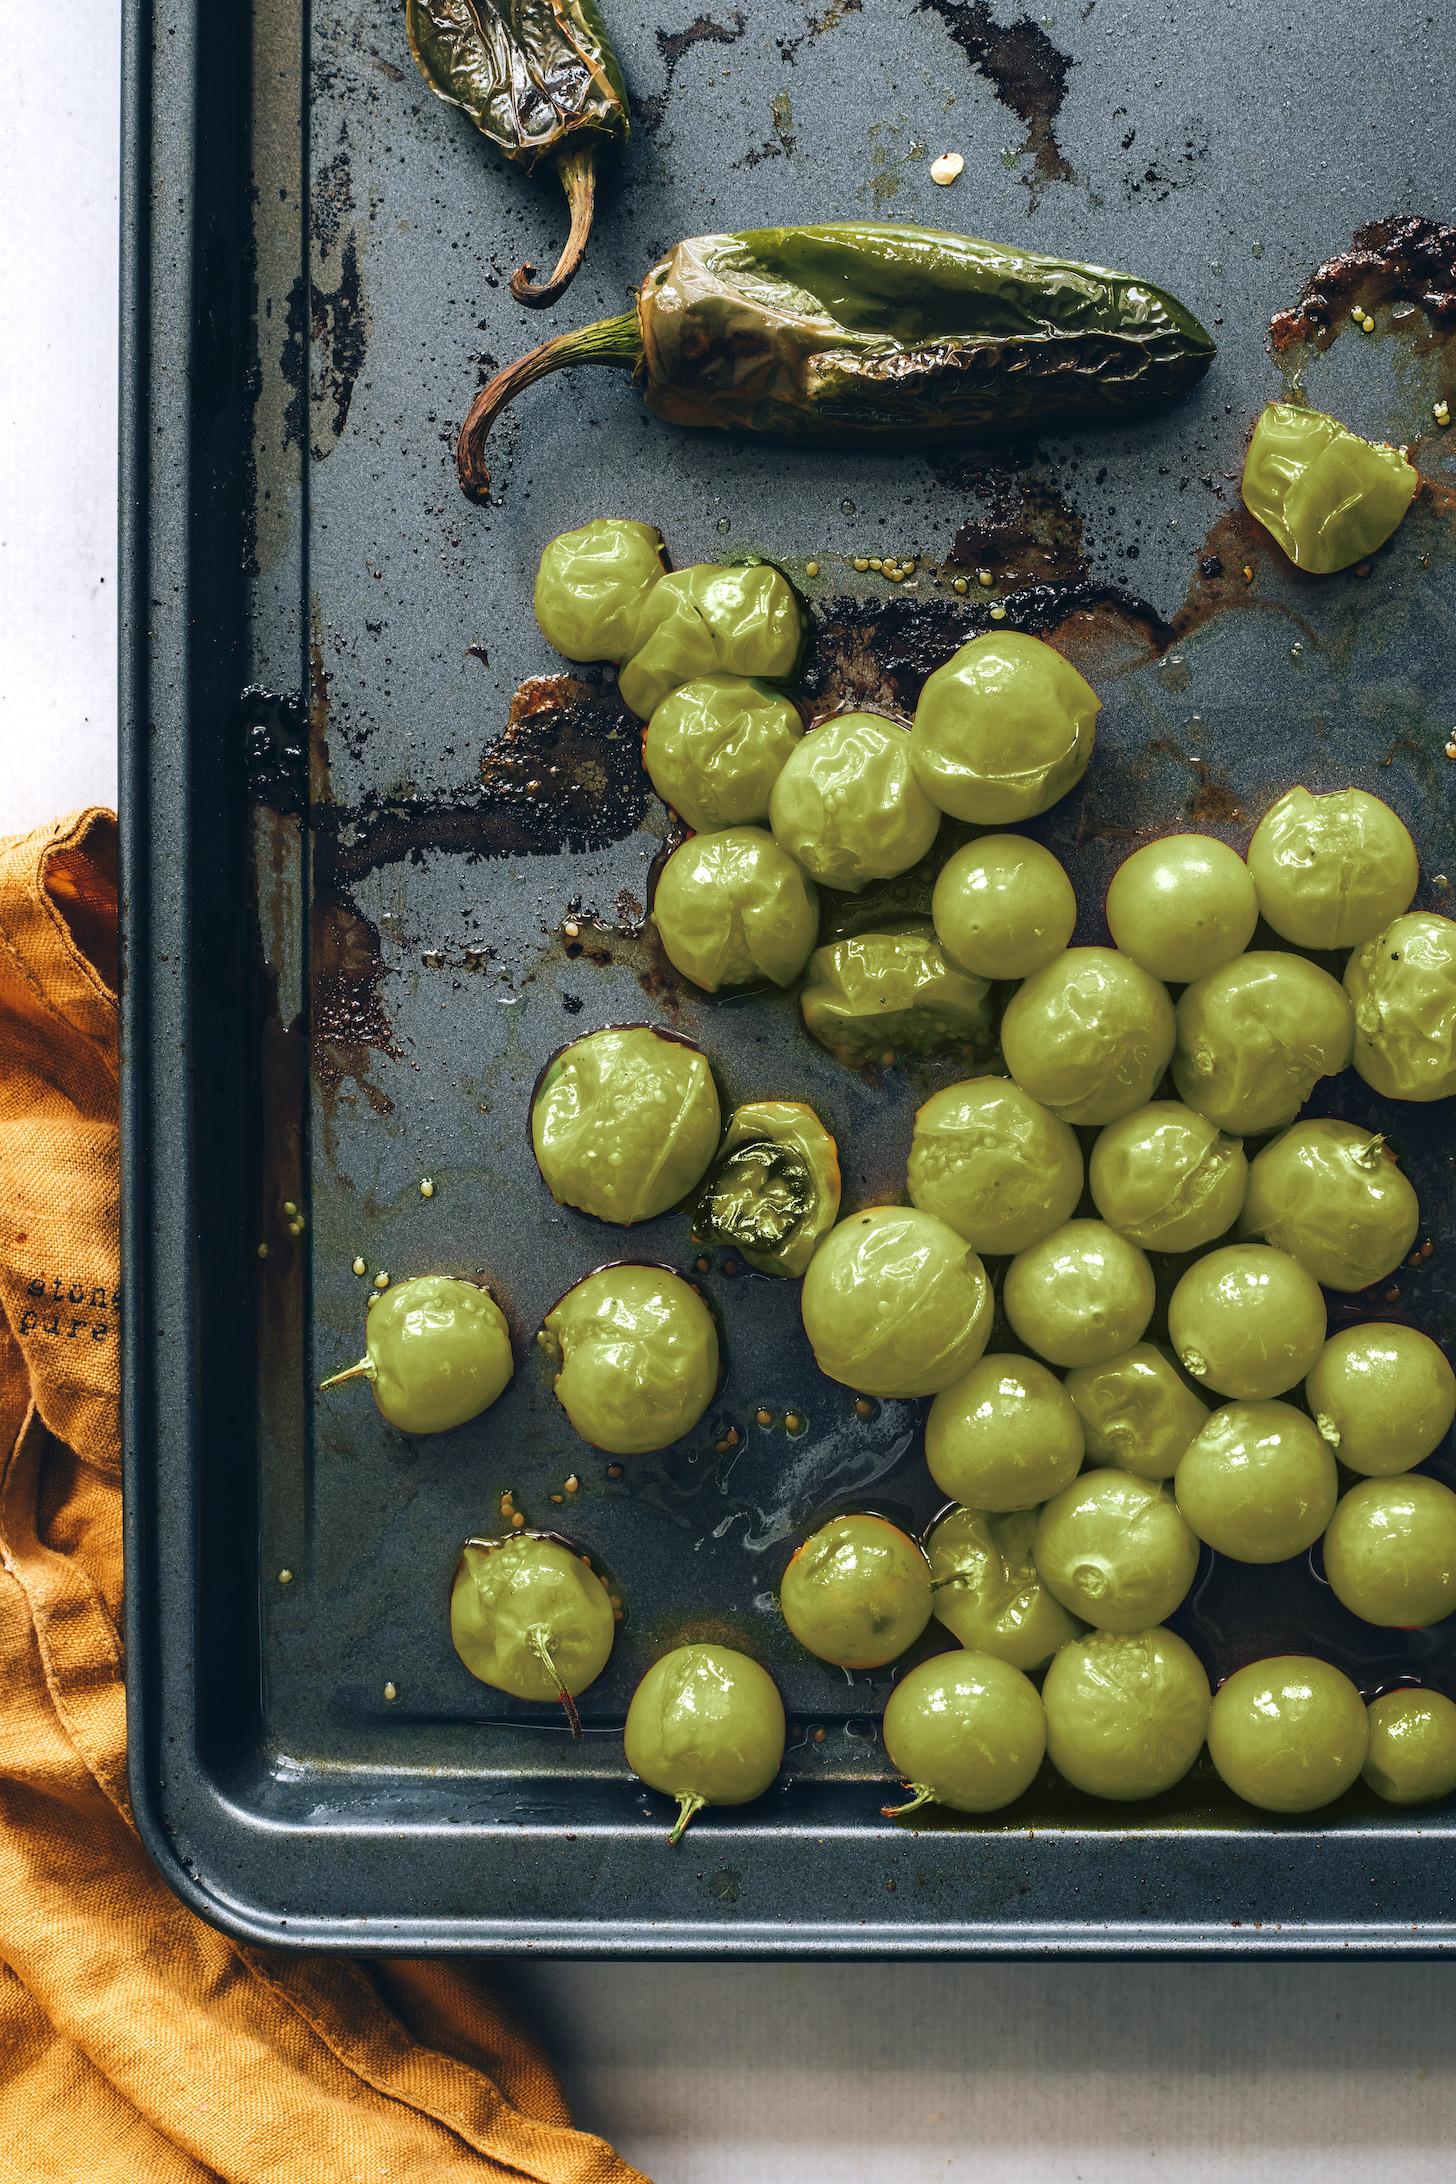 Roasted jalapeños and tomatillos on a baking sheet